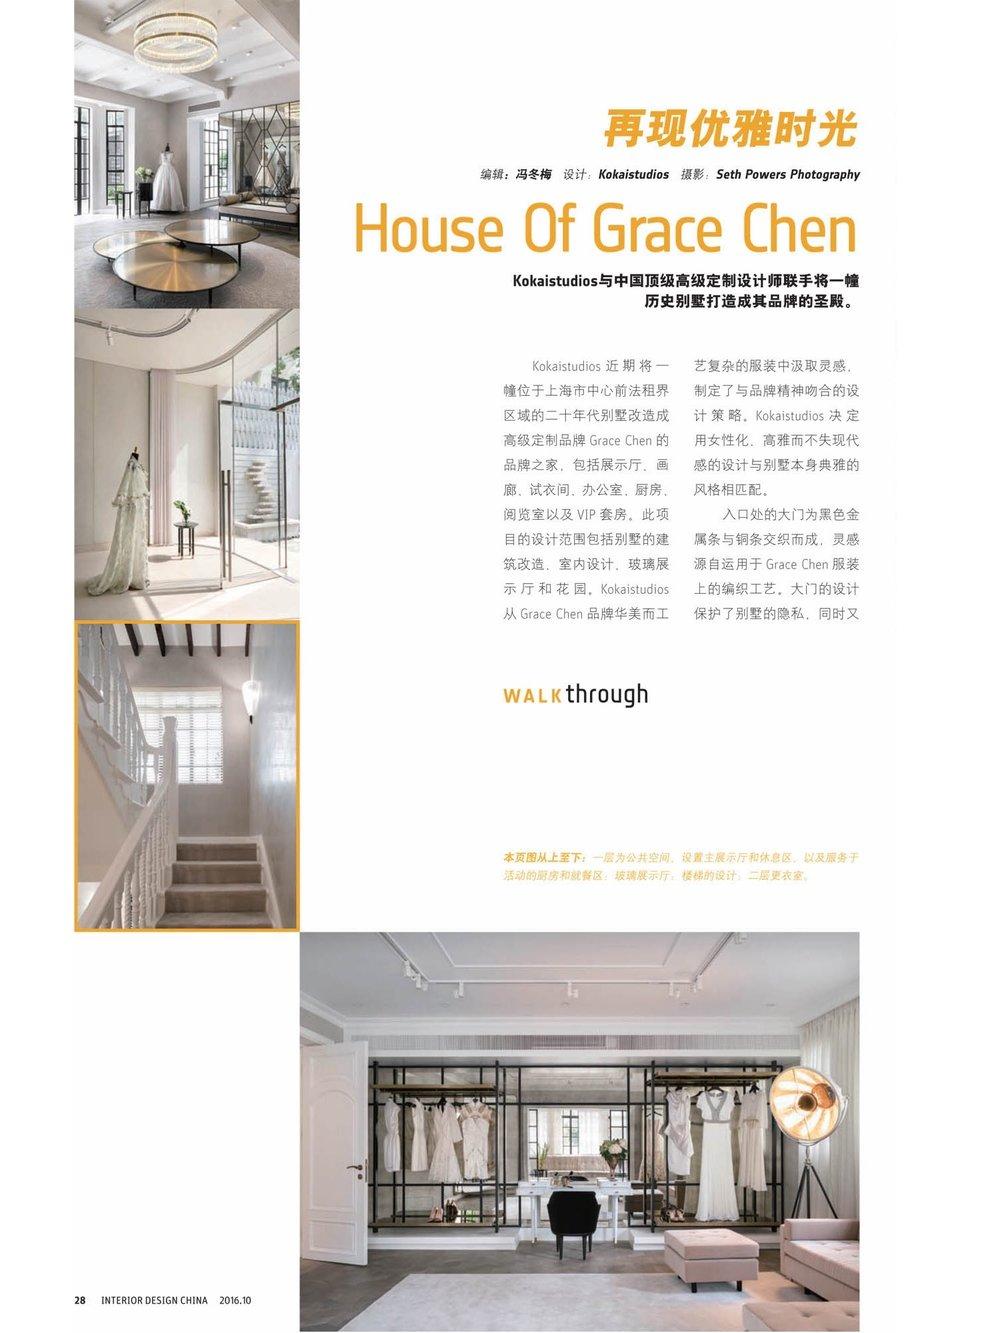 Interior Design China | October 2016 - House of Grace Chen |Kokaistudios